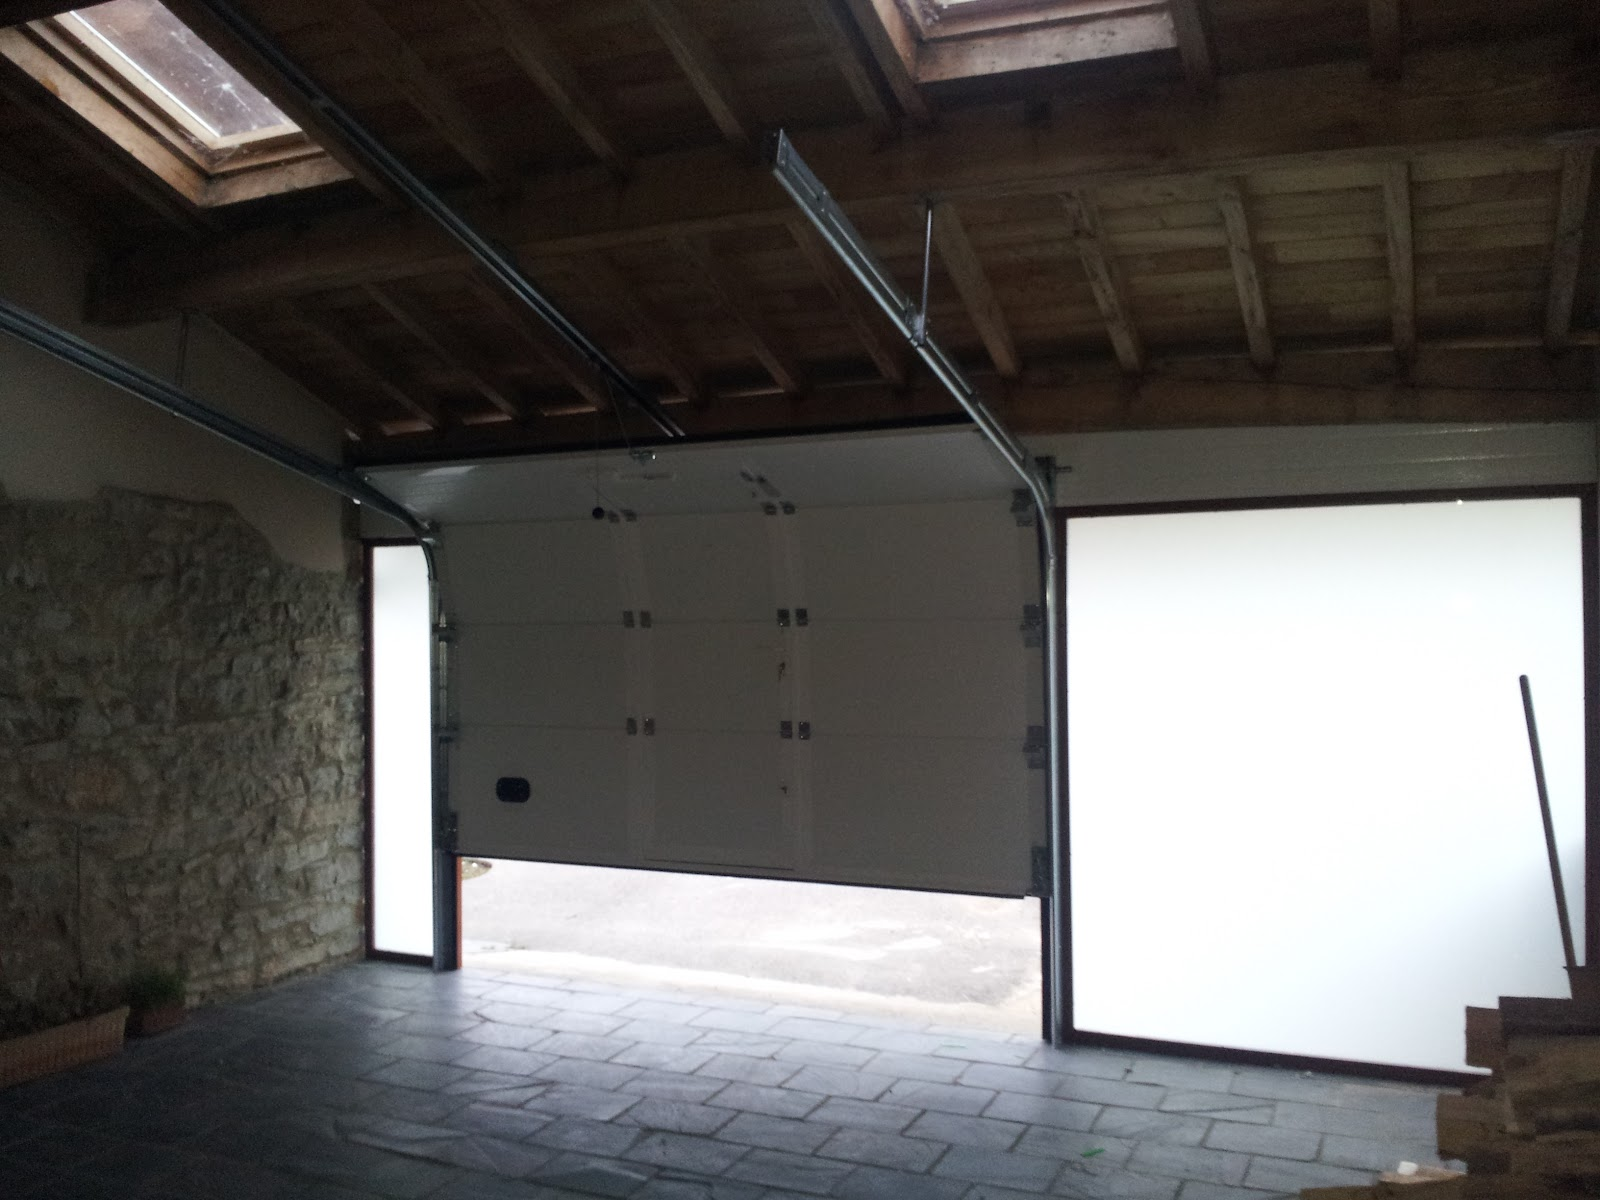 punto de recarga para un coche eléctrico en un garaje